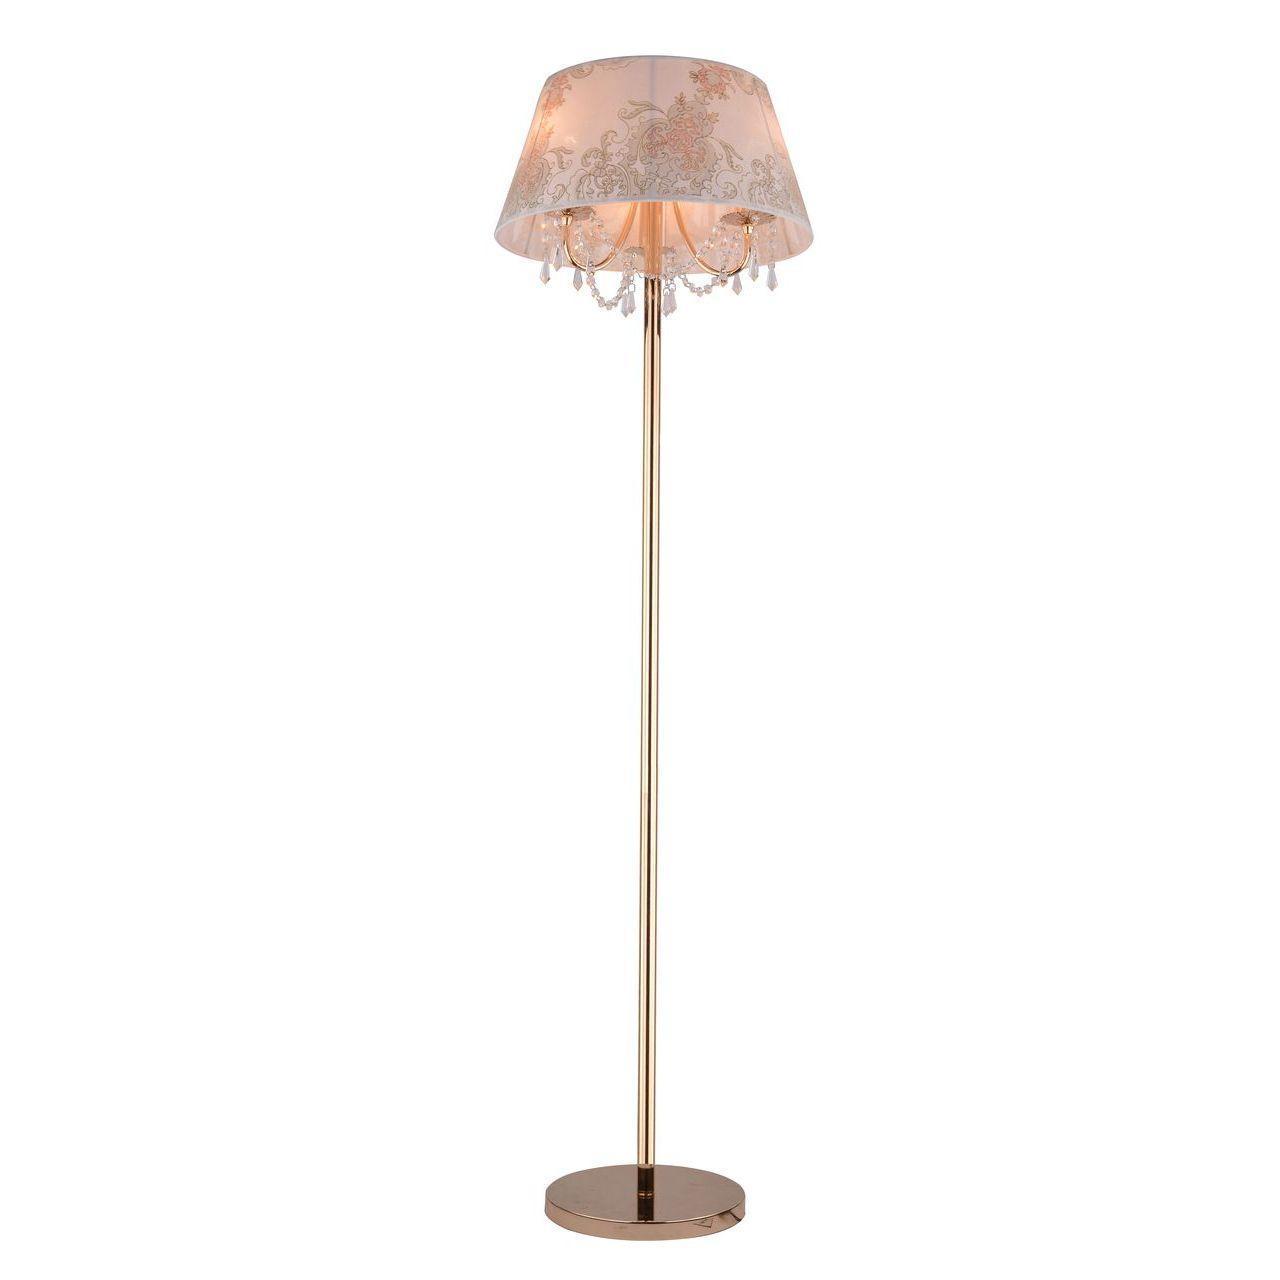 Торшер Arte Lamp Armonico A5008PN-3GO все цены